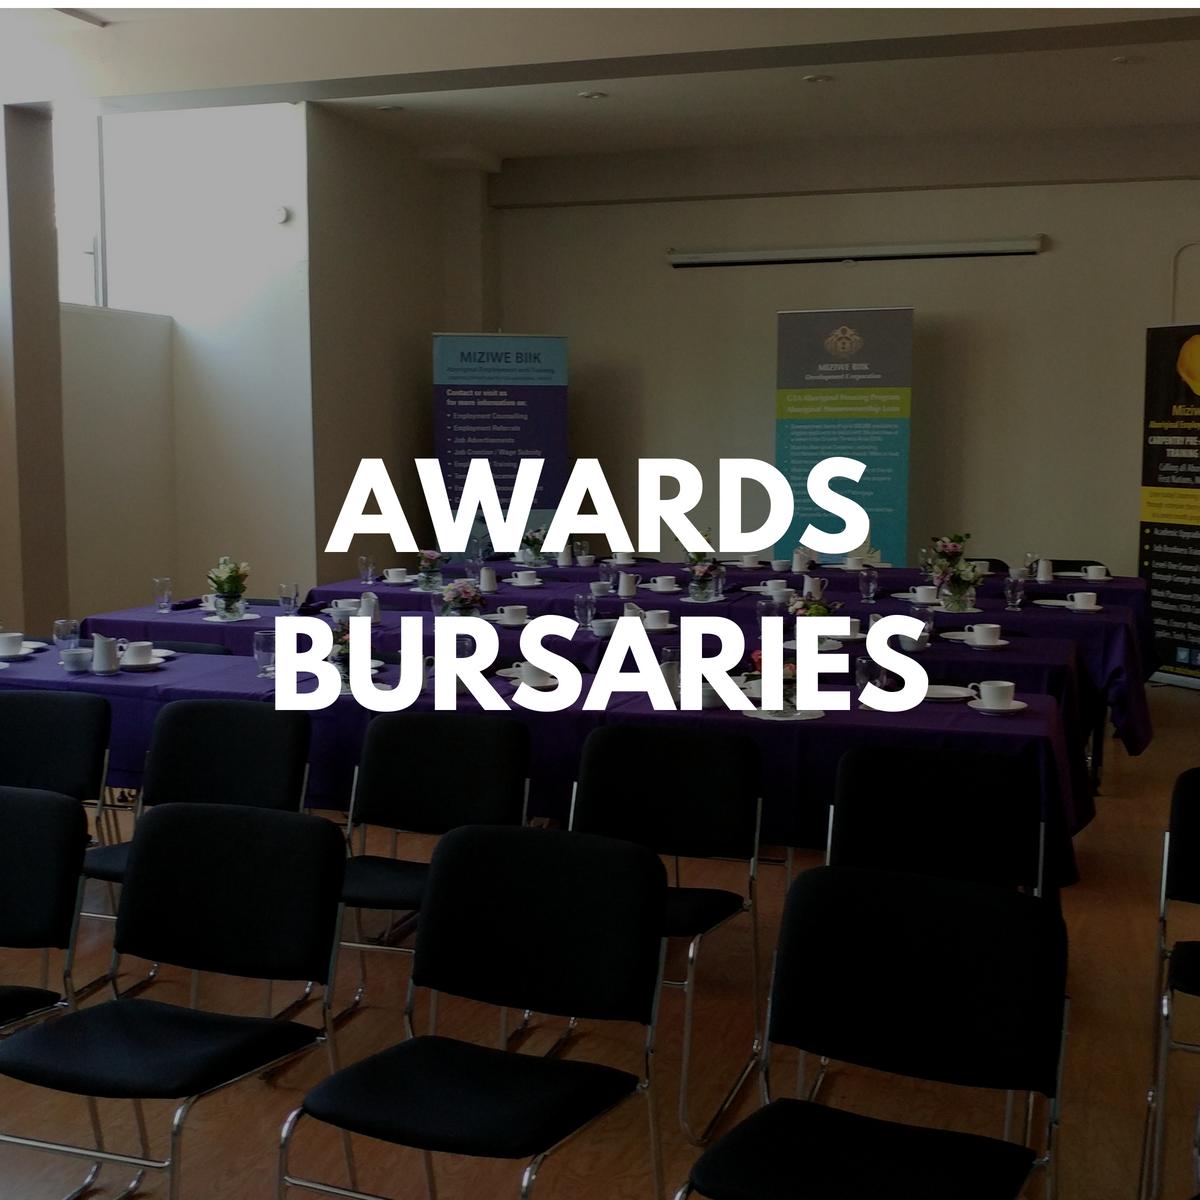 Awards/Bursaries